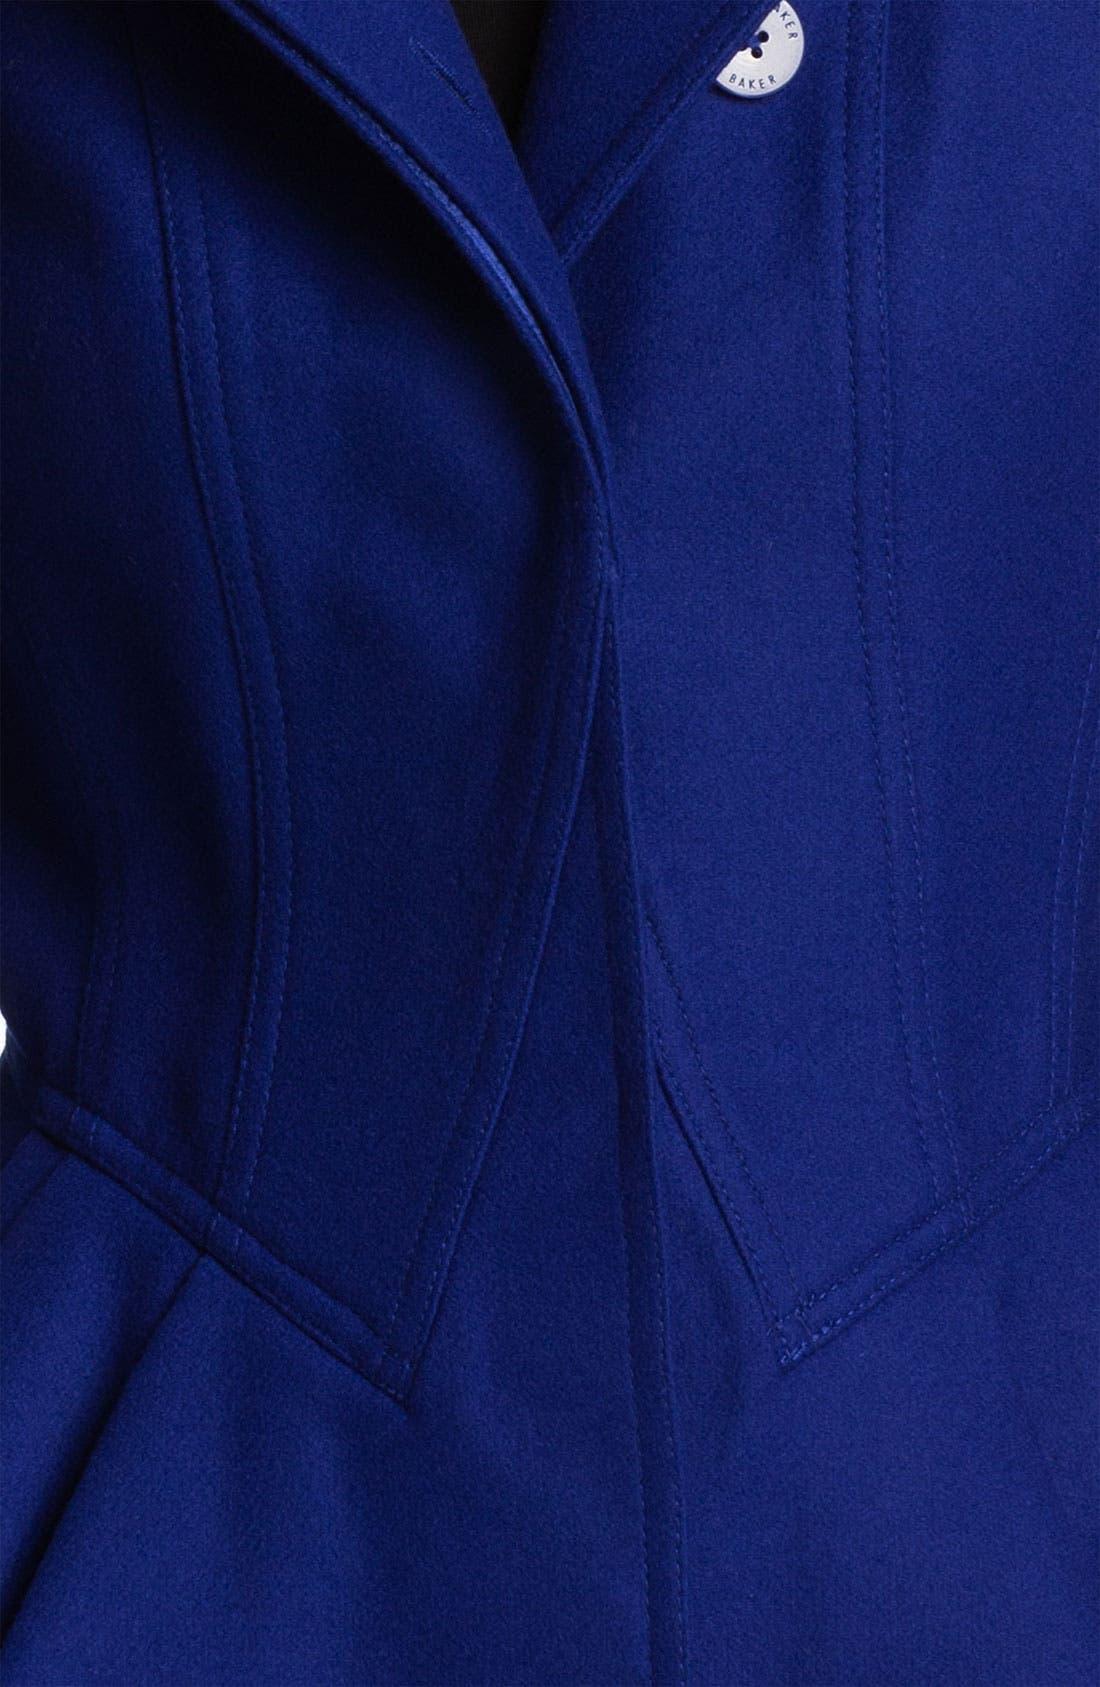 Alternate Image 3  - Ted Baker London Peplum Wool Jacket